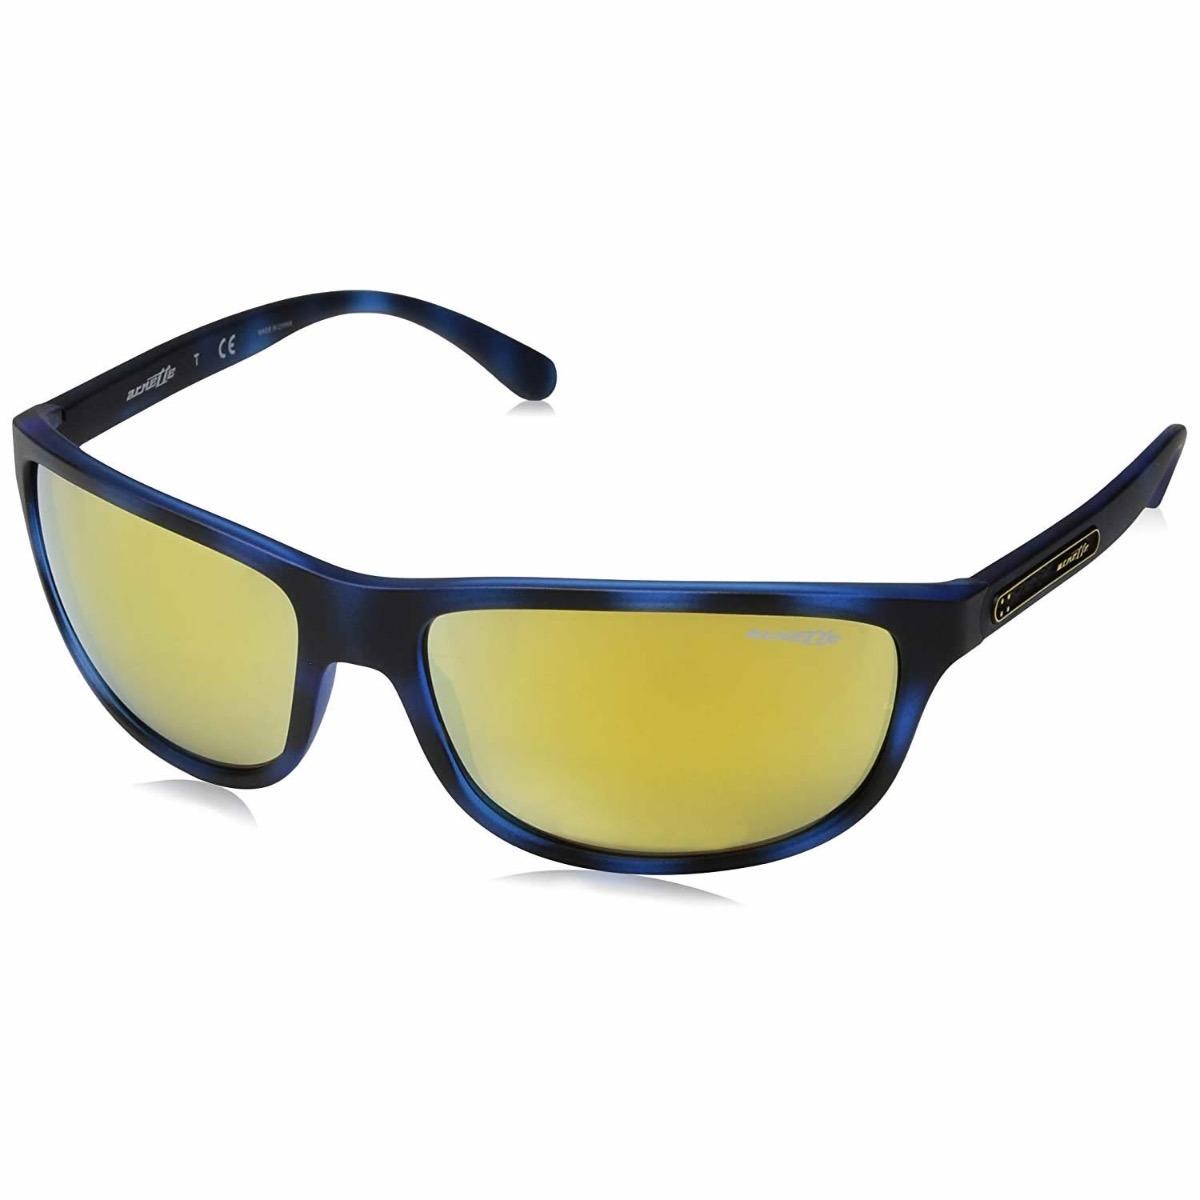 95777001c3 Lentes Arnette Grip Tape Matte Blue Havana / Mirror Yellow ...